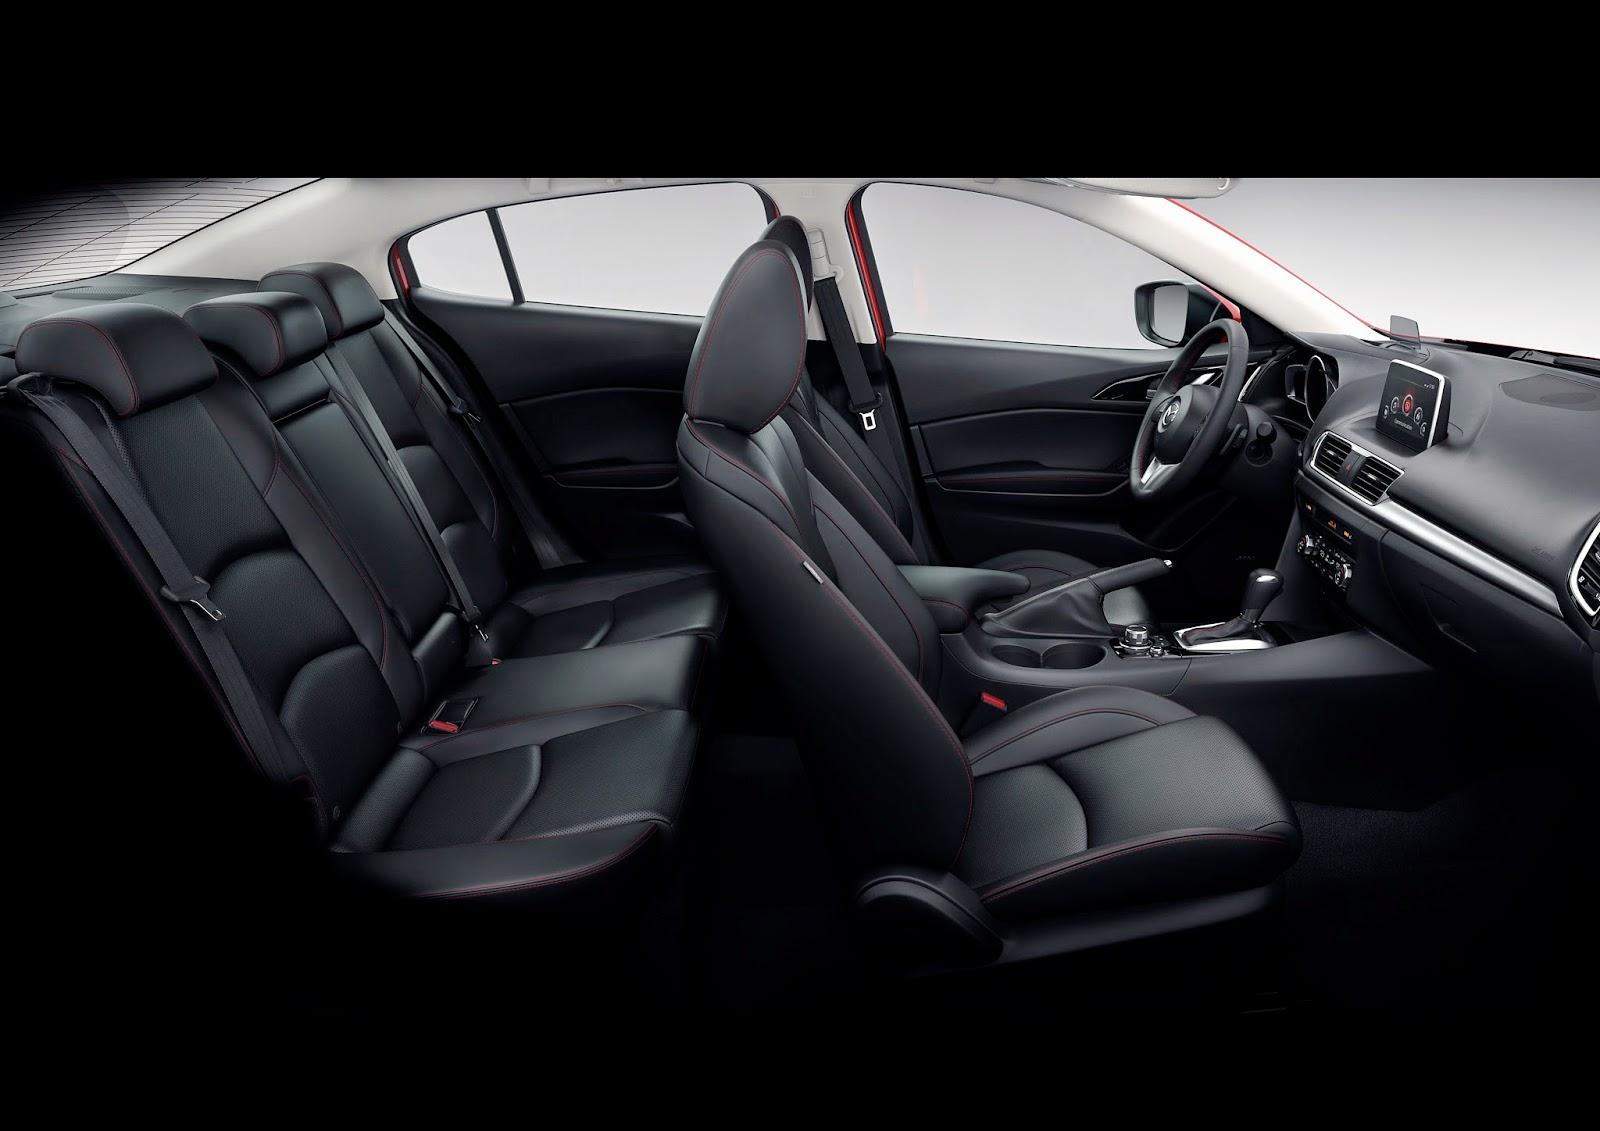 Interior view of 2015 Mazda 3